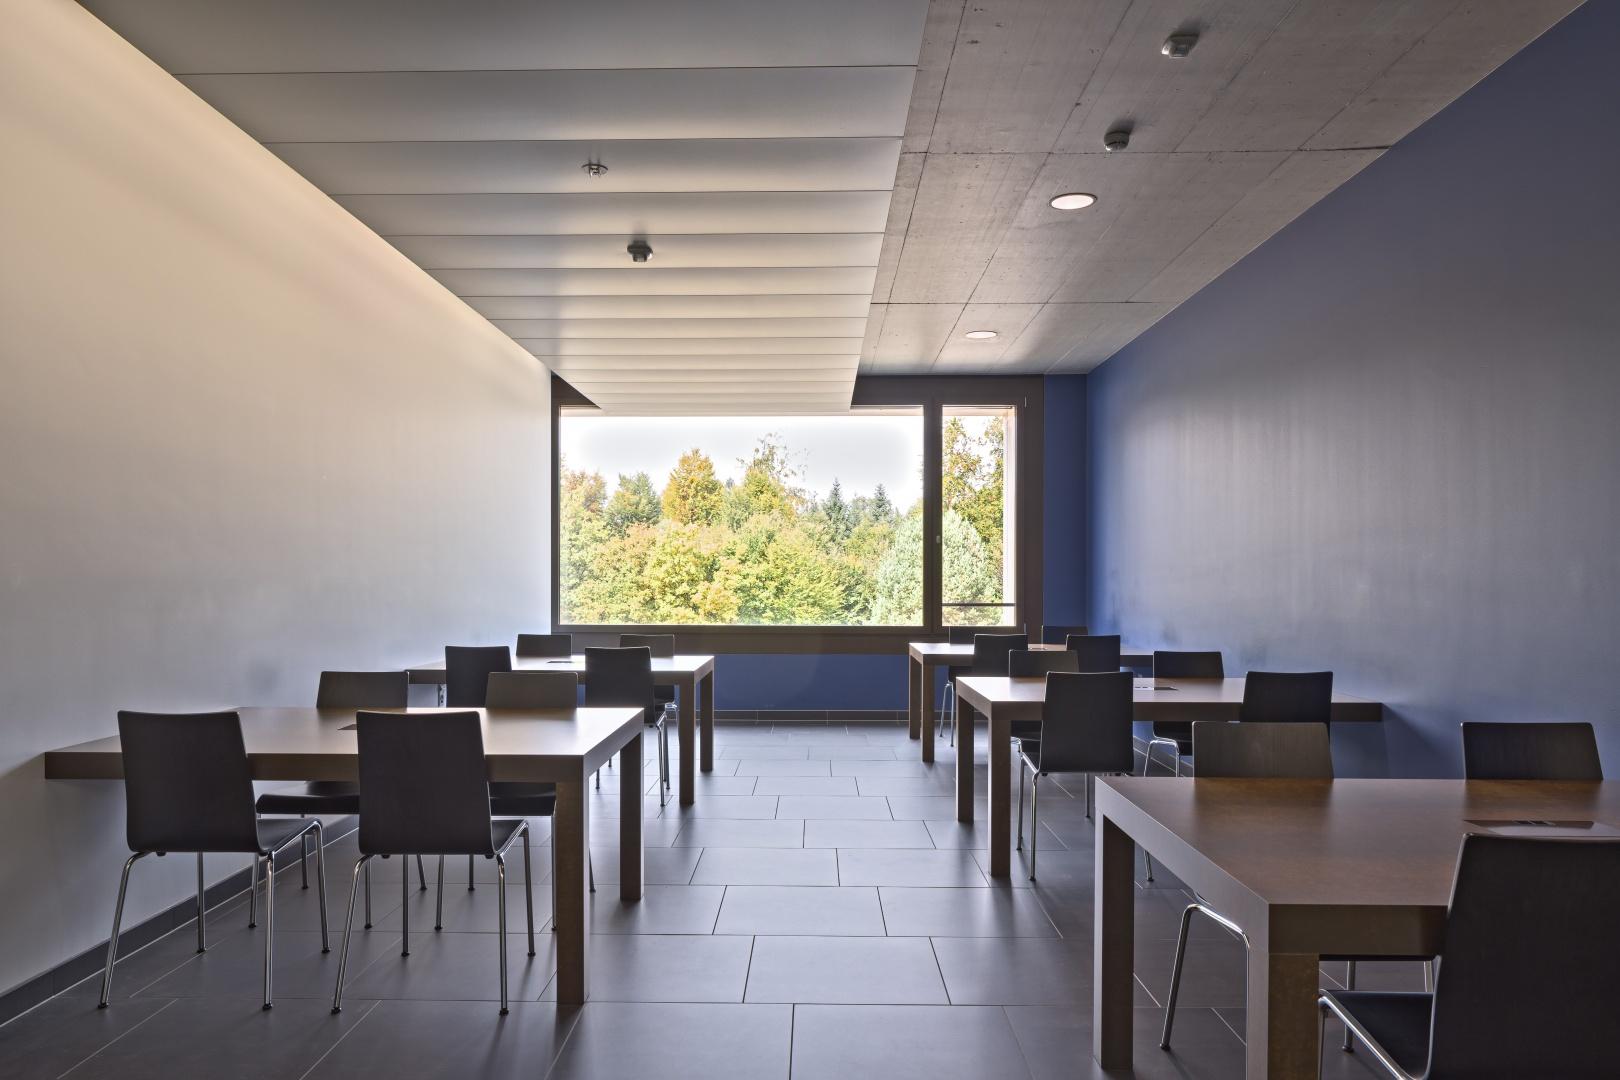 Arbeitsnische Korridor 2. OG © Stefano Schröter, 6003 Luzern